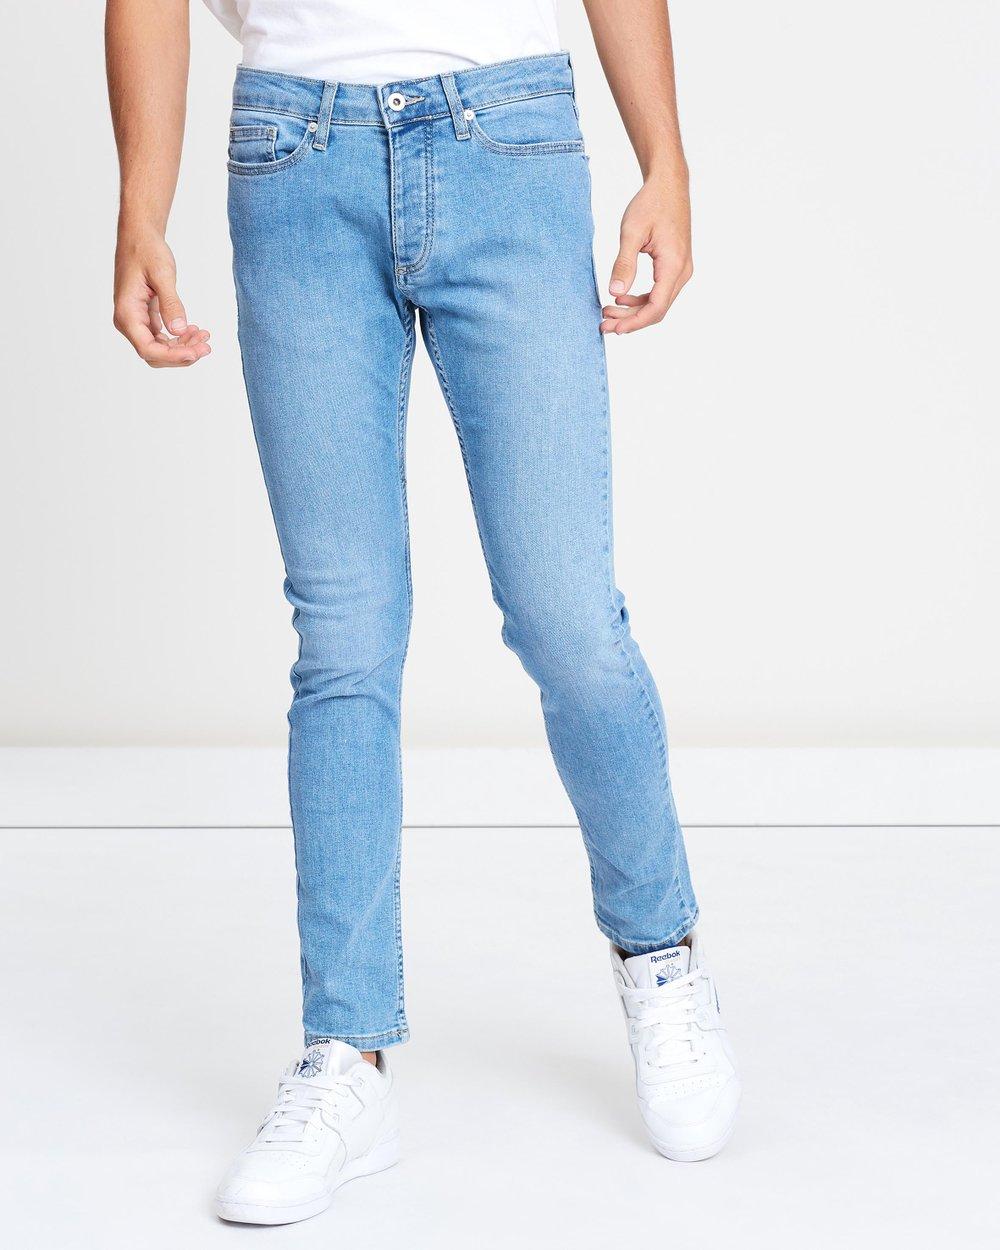 542593c3 Stretch Skinny Jeans by Topman Online | THE ICONIC | Australia